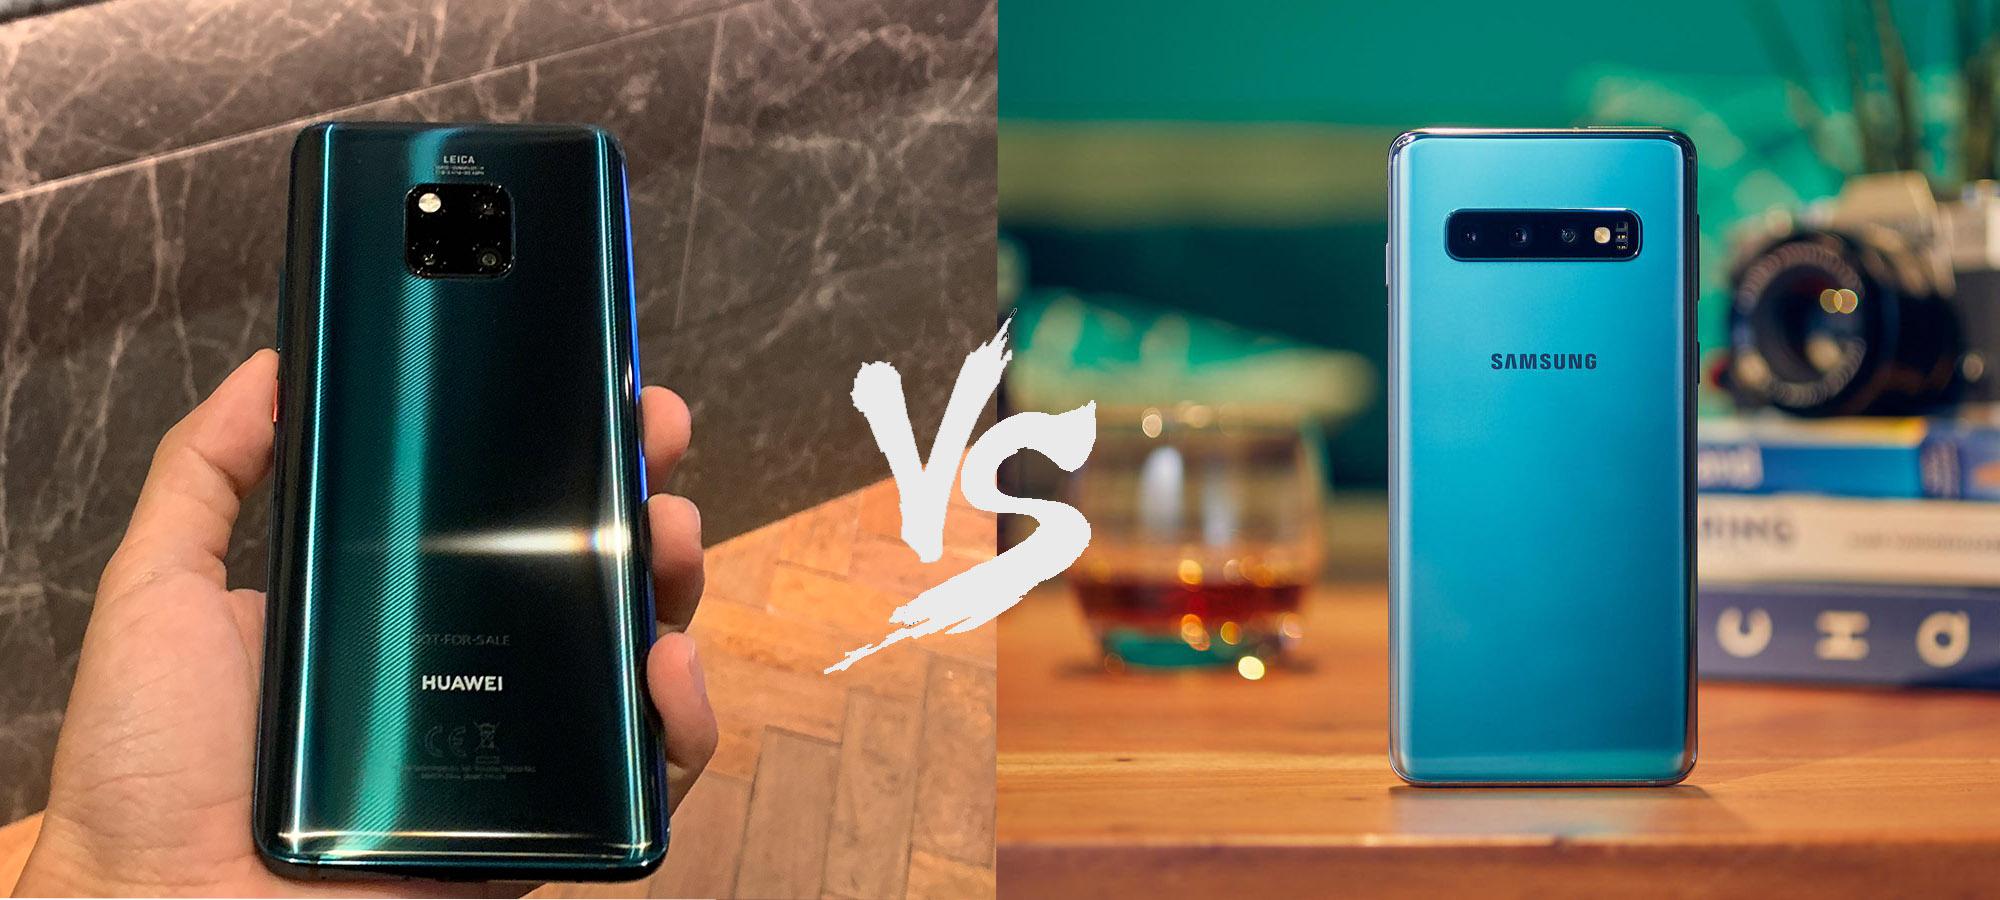 Huawei Mate 20 Pro vs Samsung Galaxy S10